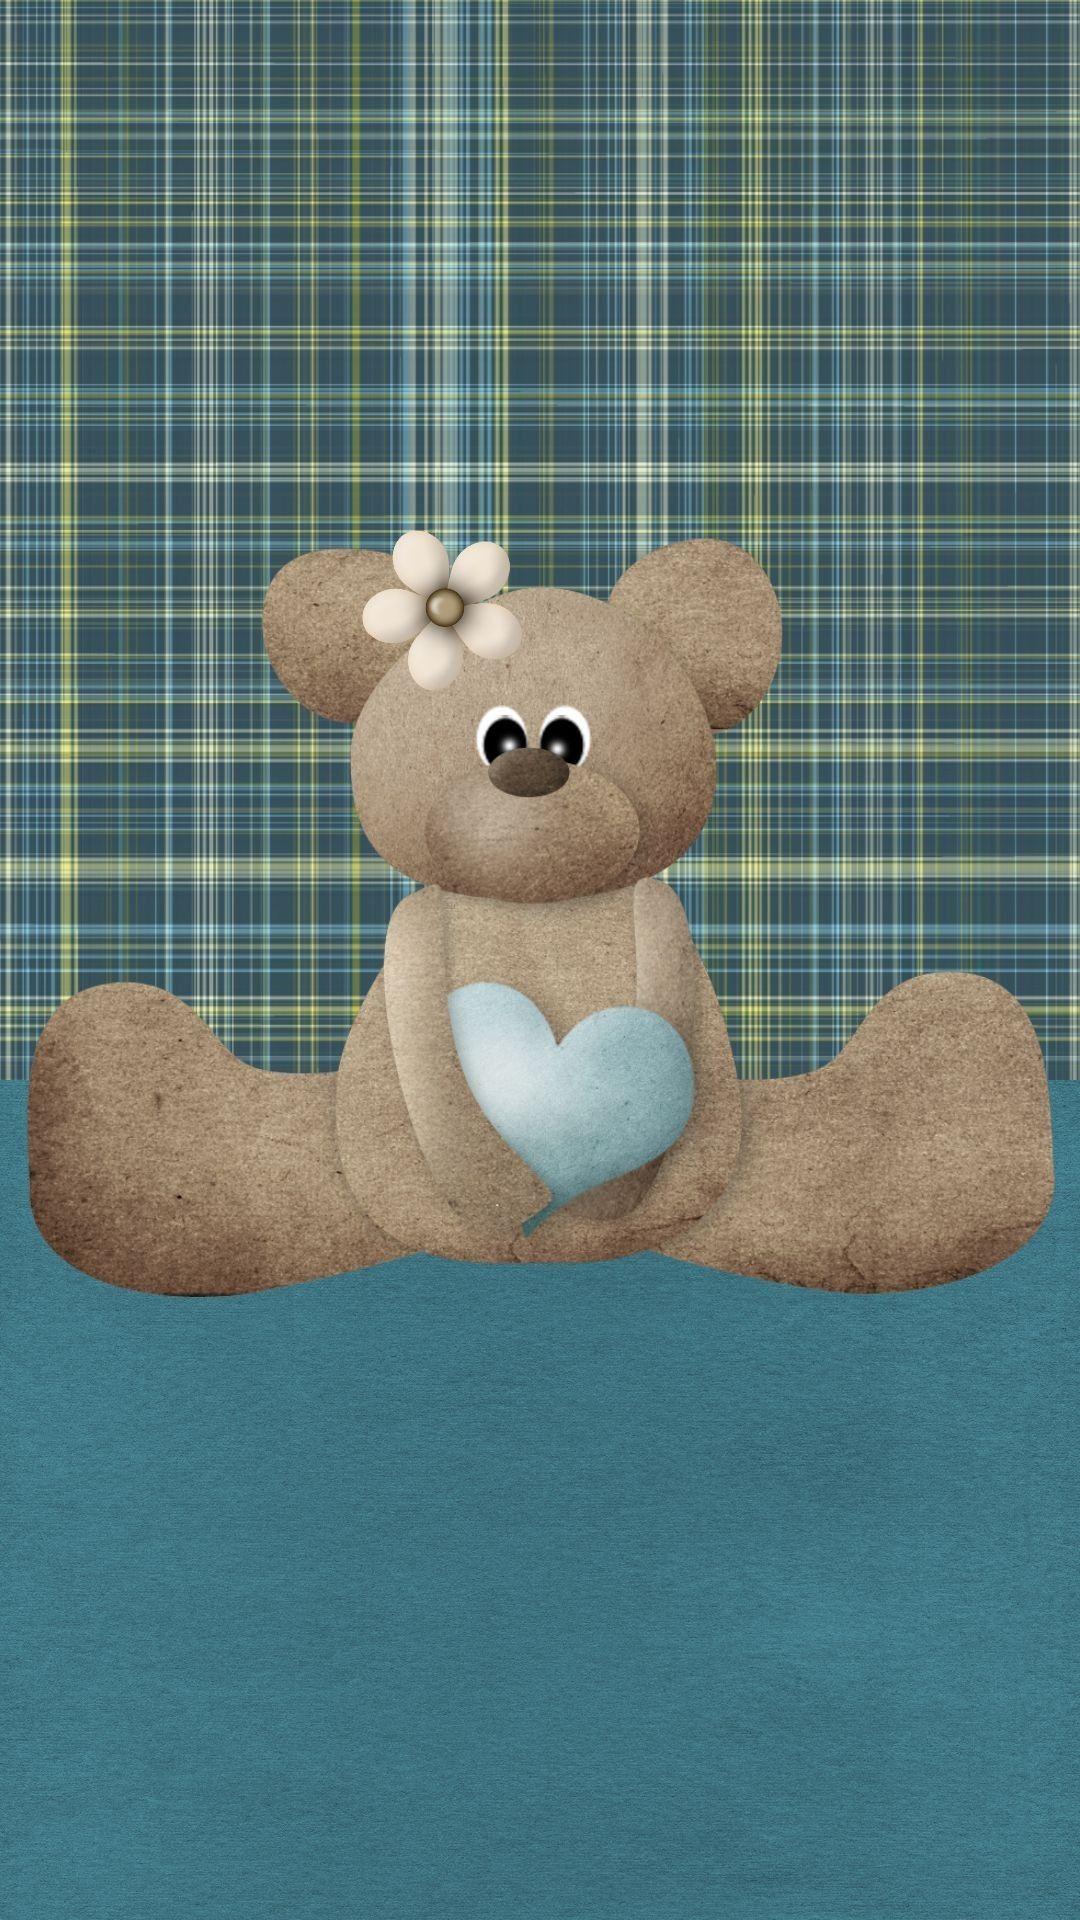 Pin by melissa Johnson on teddy bear wallpaper Teddy